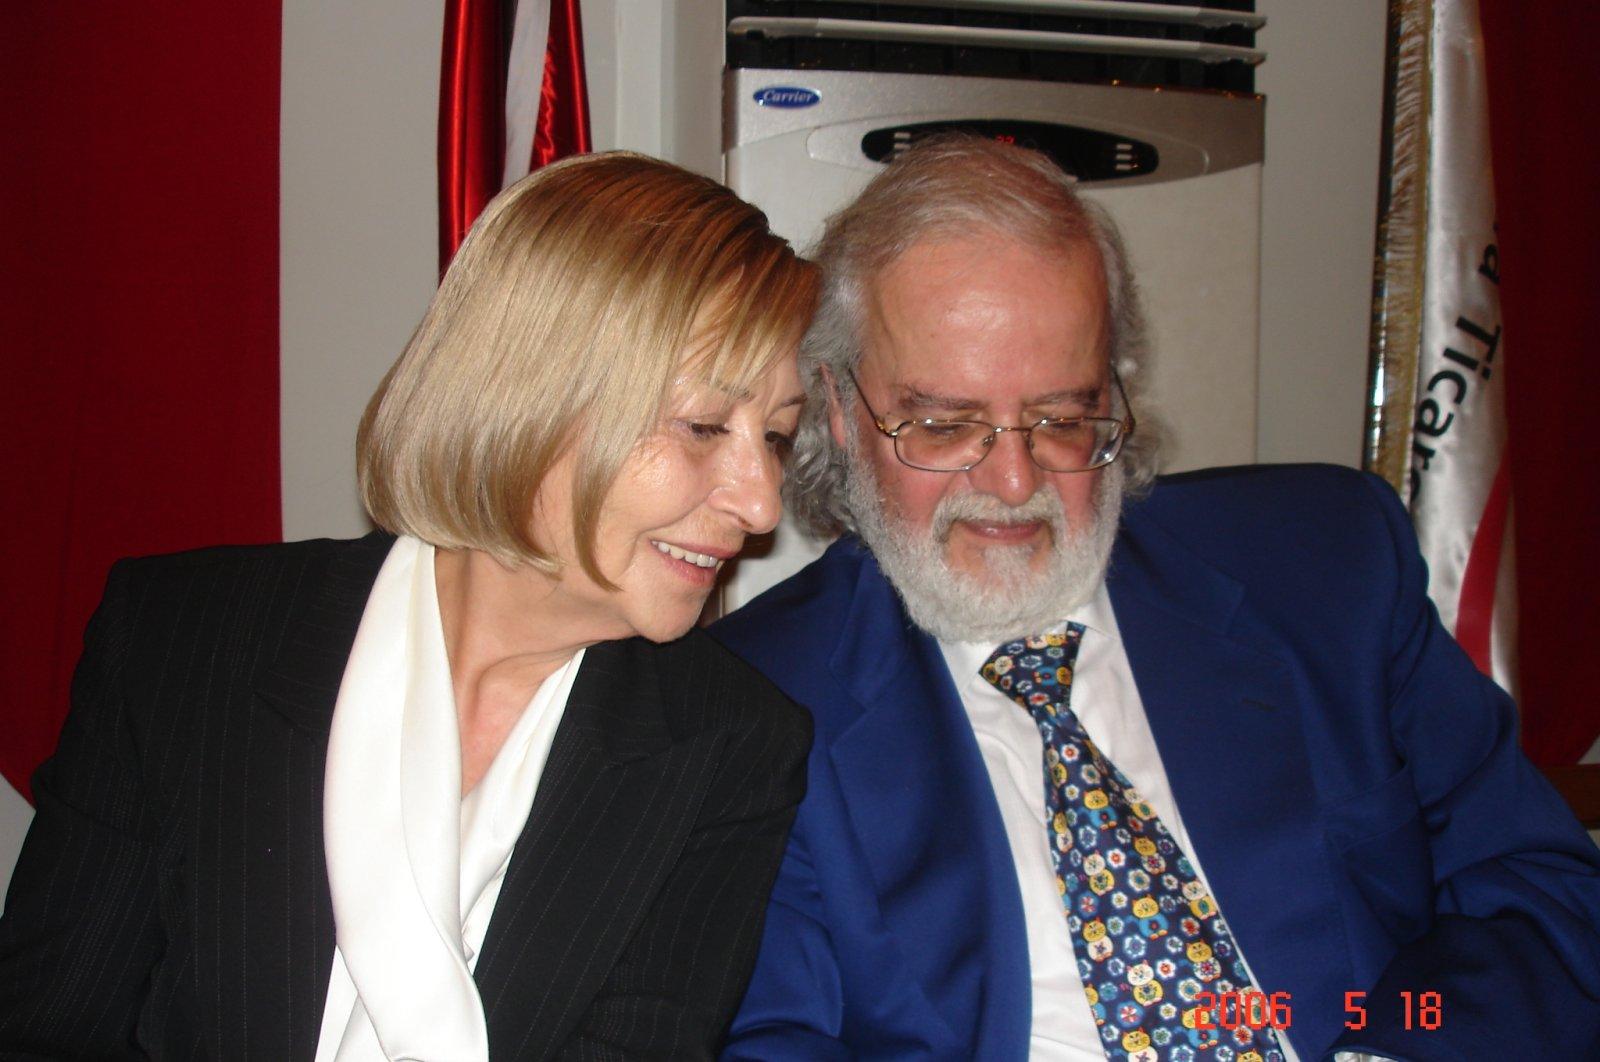 Emine Işınsu Öksüz (L) chats with her husband Professor Iskender Öksüz at an event, May 18, 2006. (AA Photo)